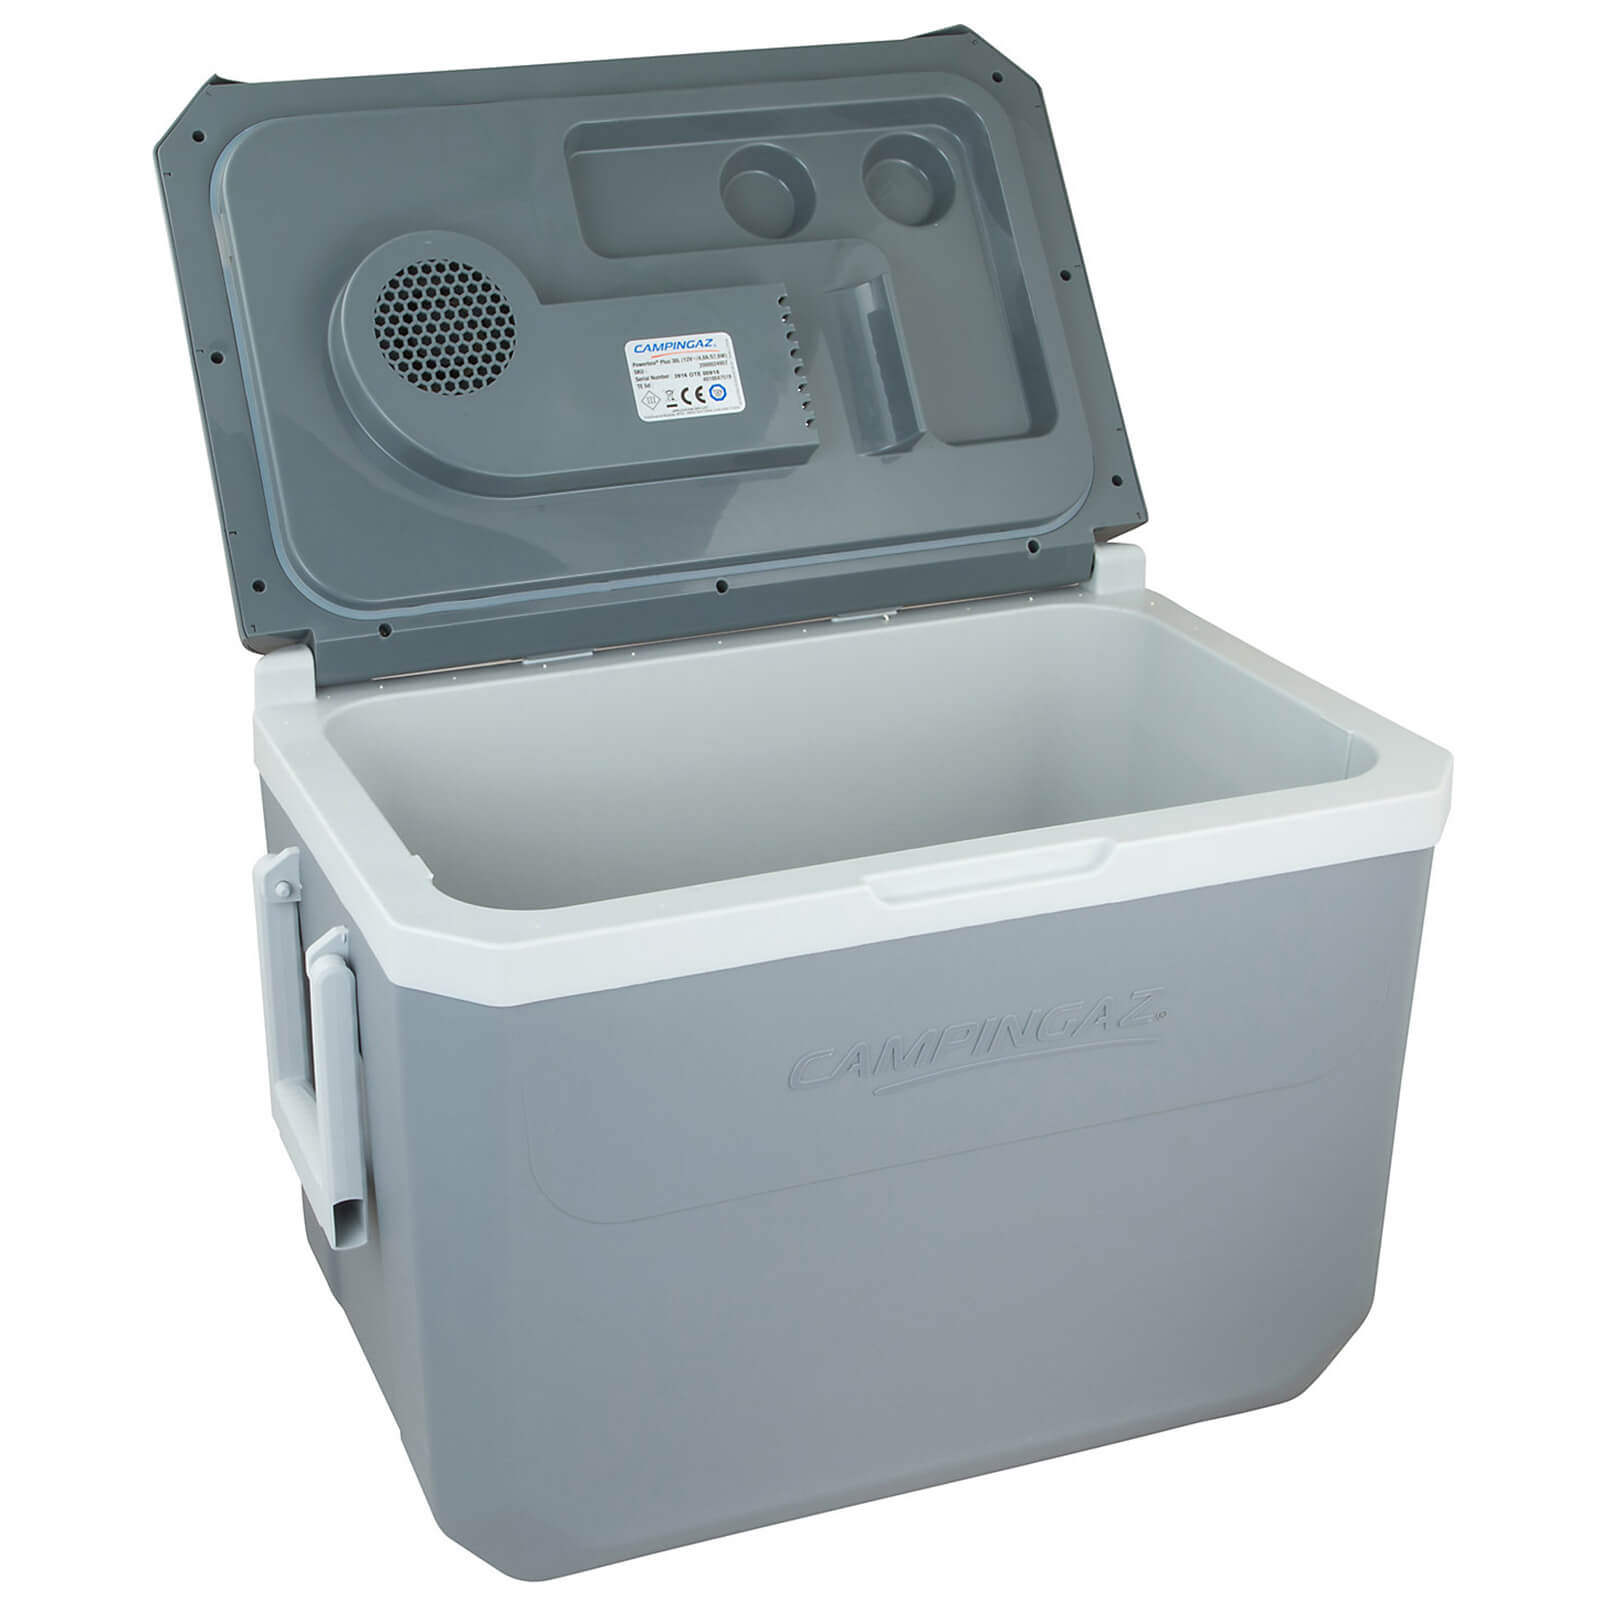 Campingaz Powerbox Plus Cooler - 12/230V 36L Homeware   Zavvi